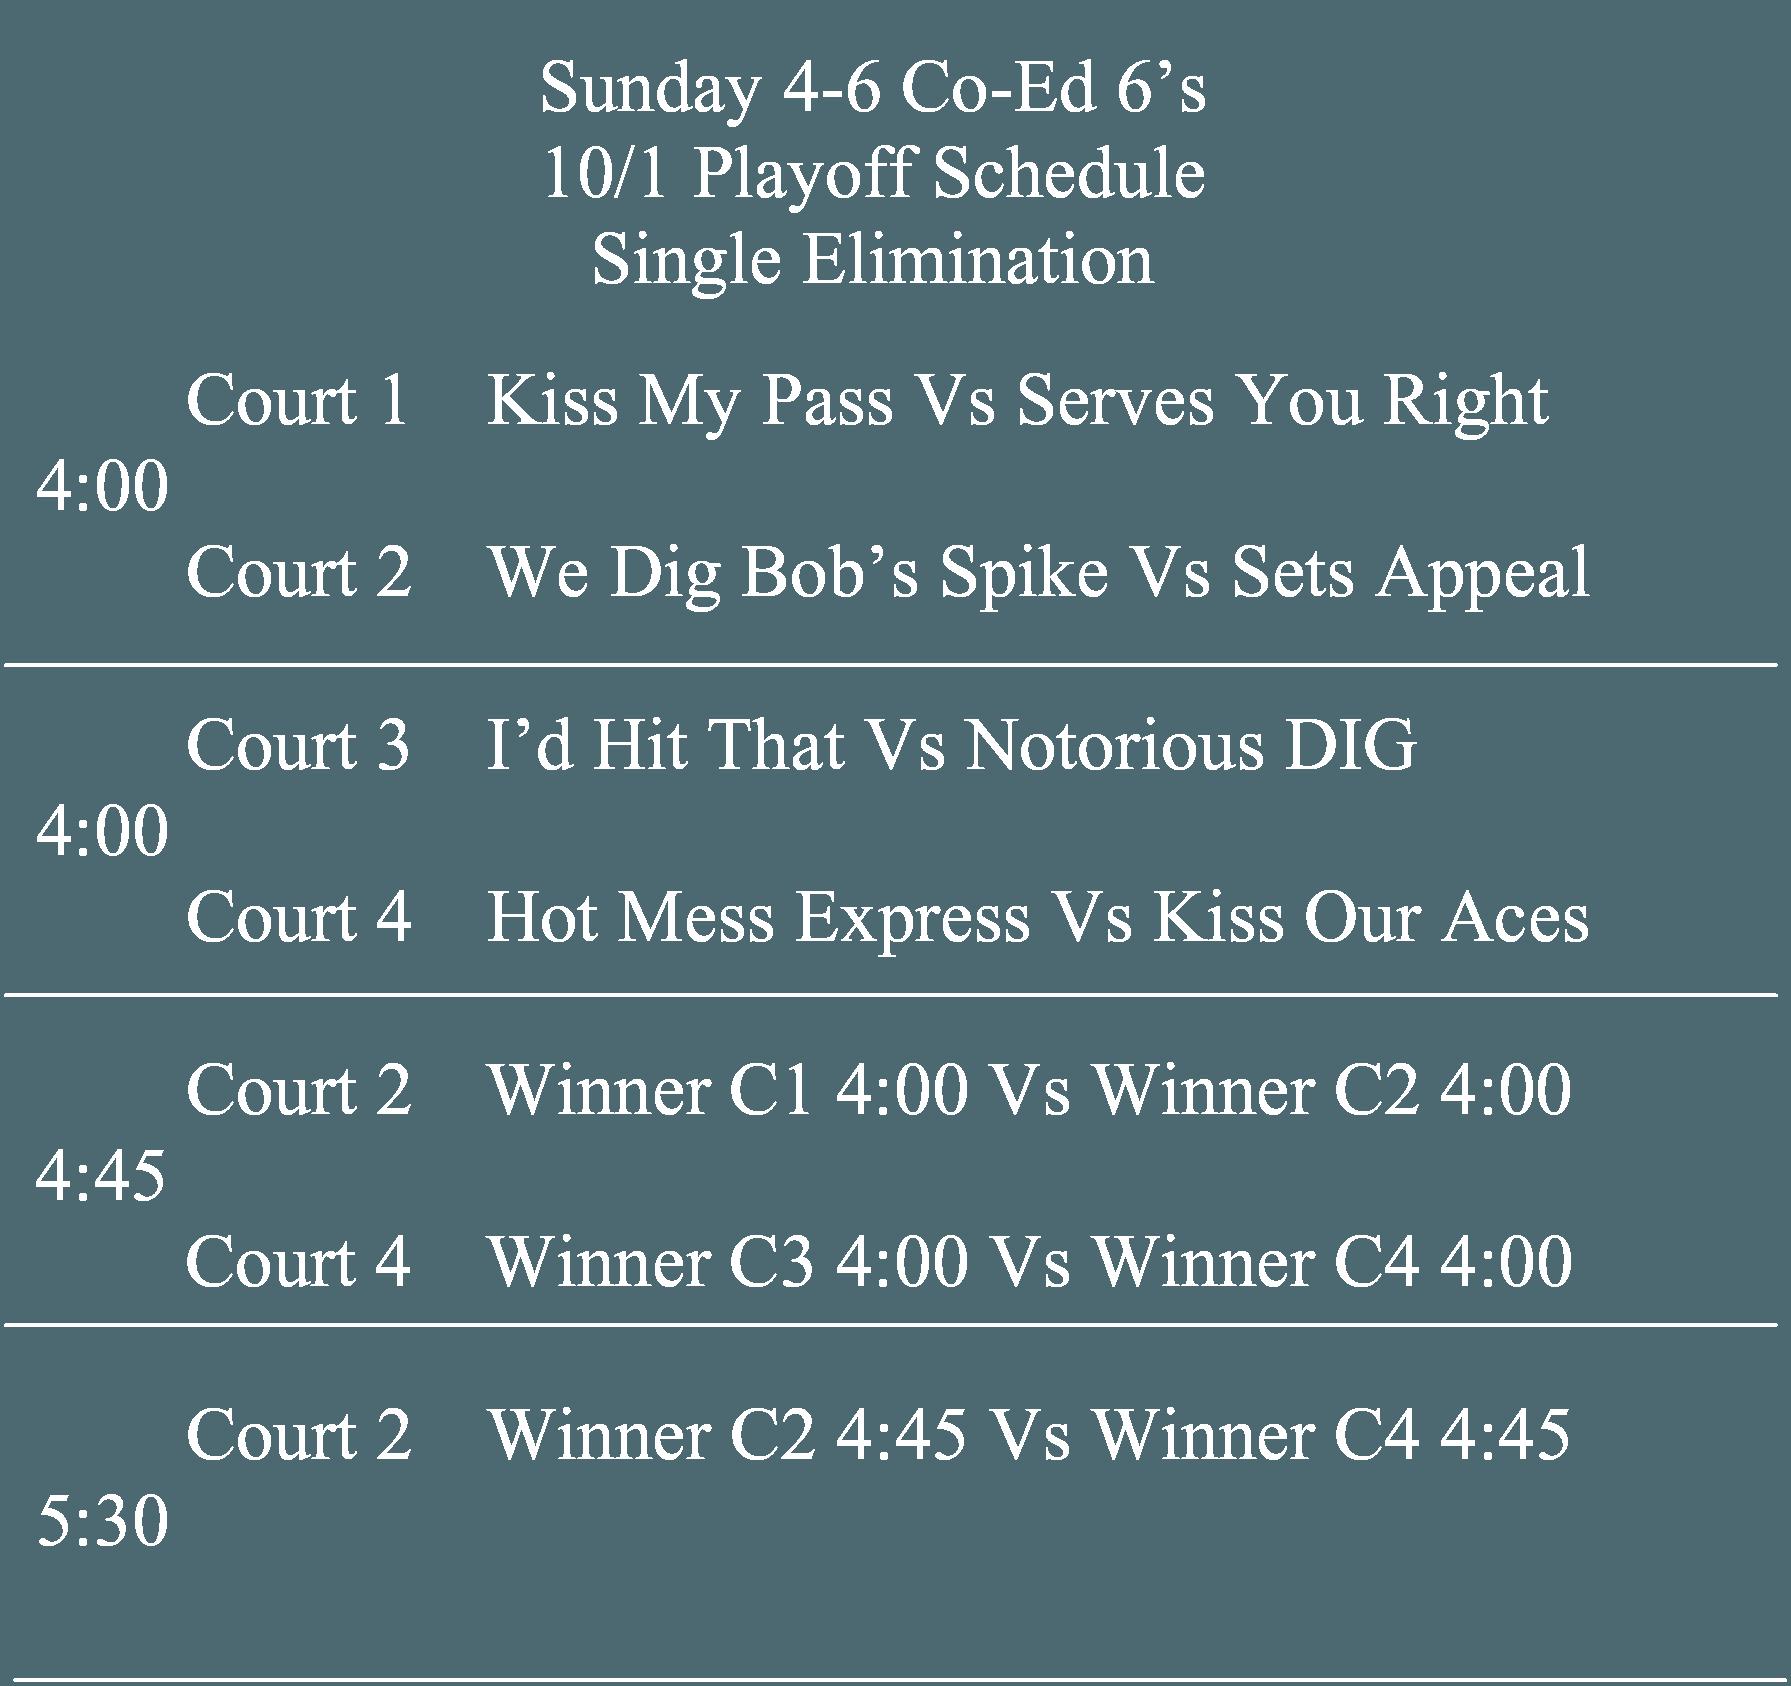 Drkula's Sunday Co-ed 6's 4-6